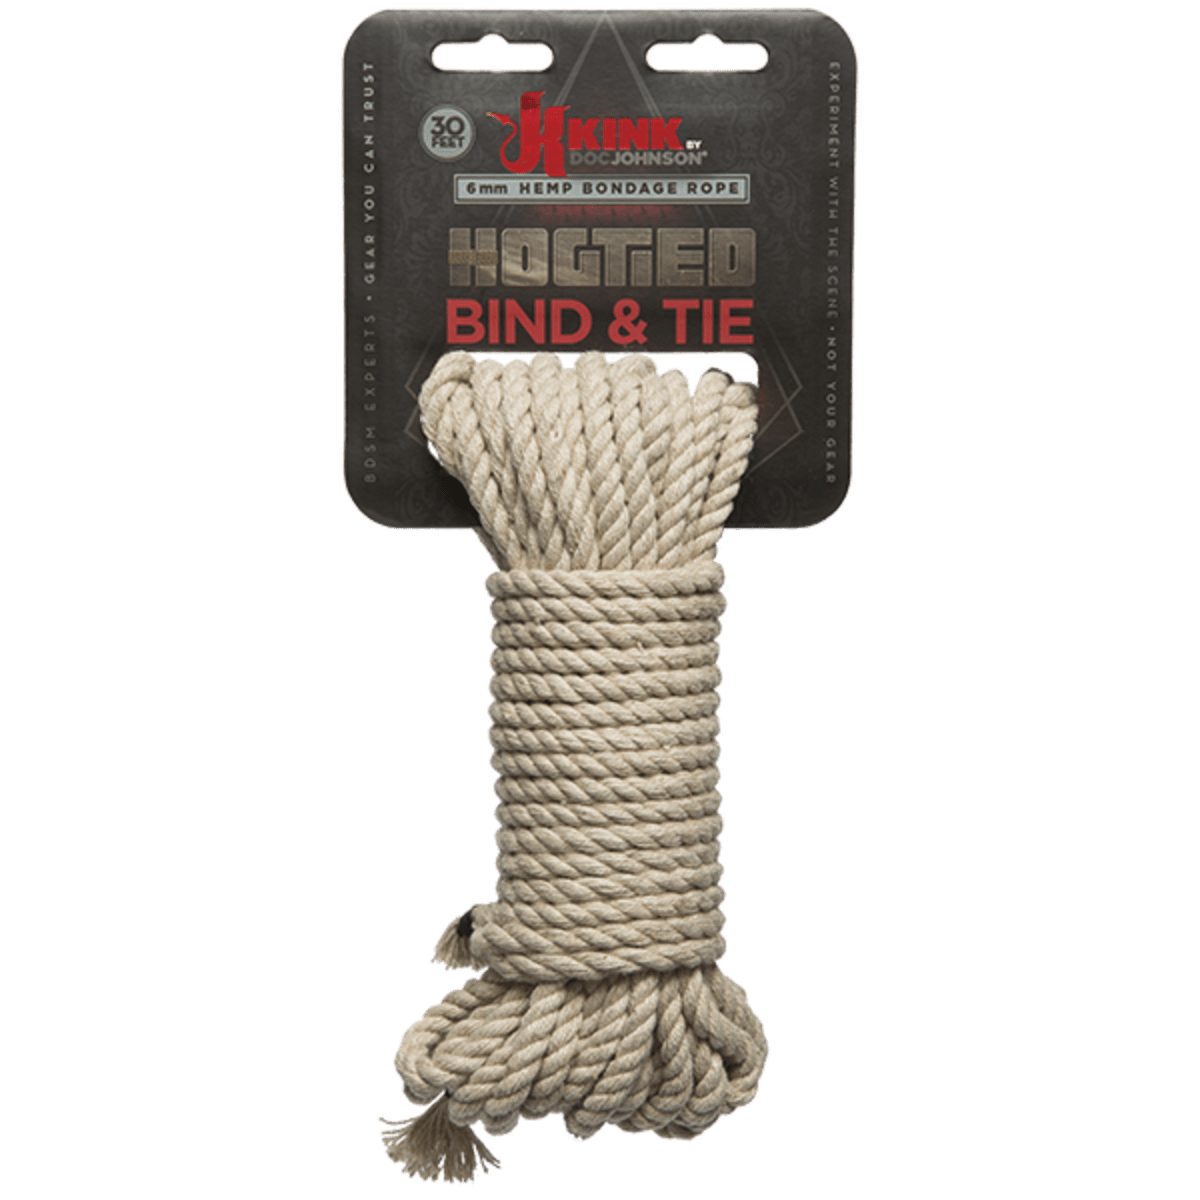 Kink Bind And Tie Hemp Bondage Rope 30 FT Natural